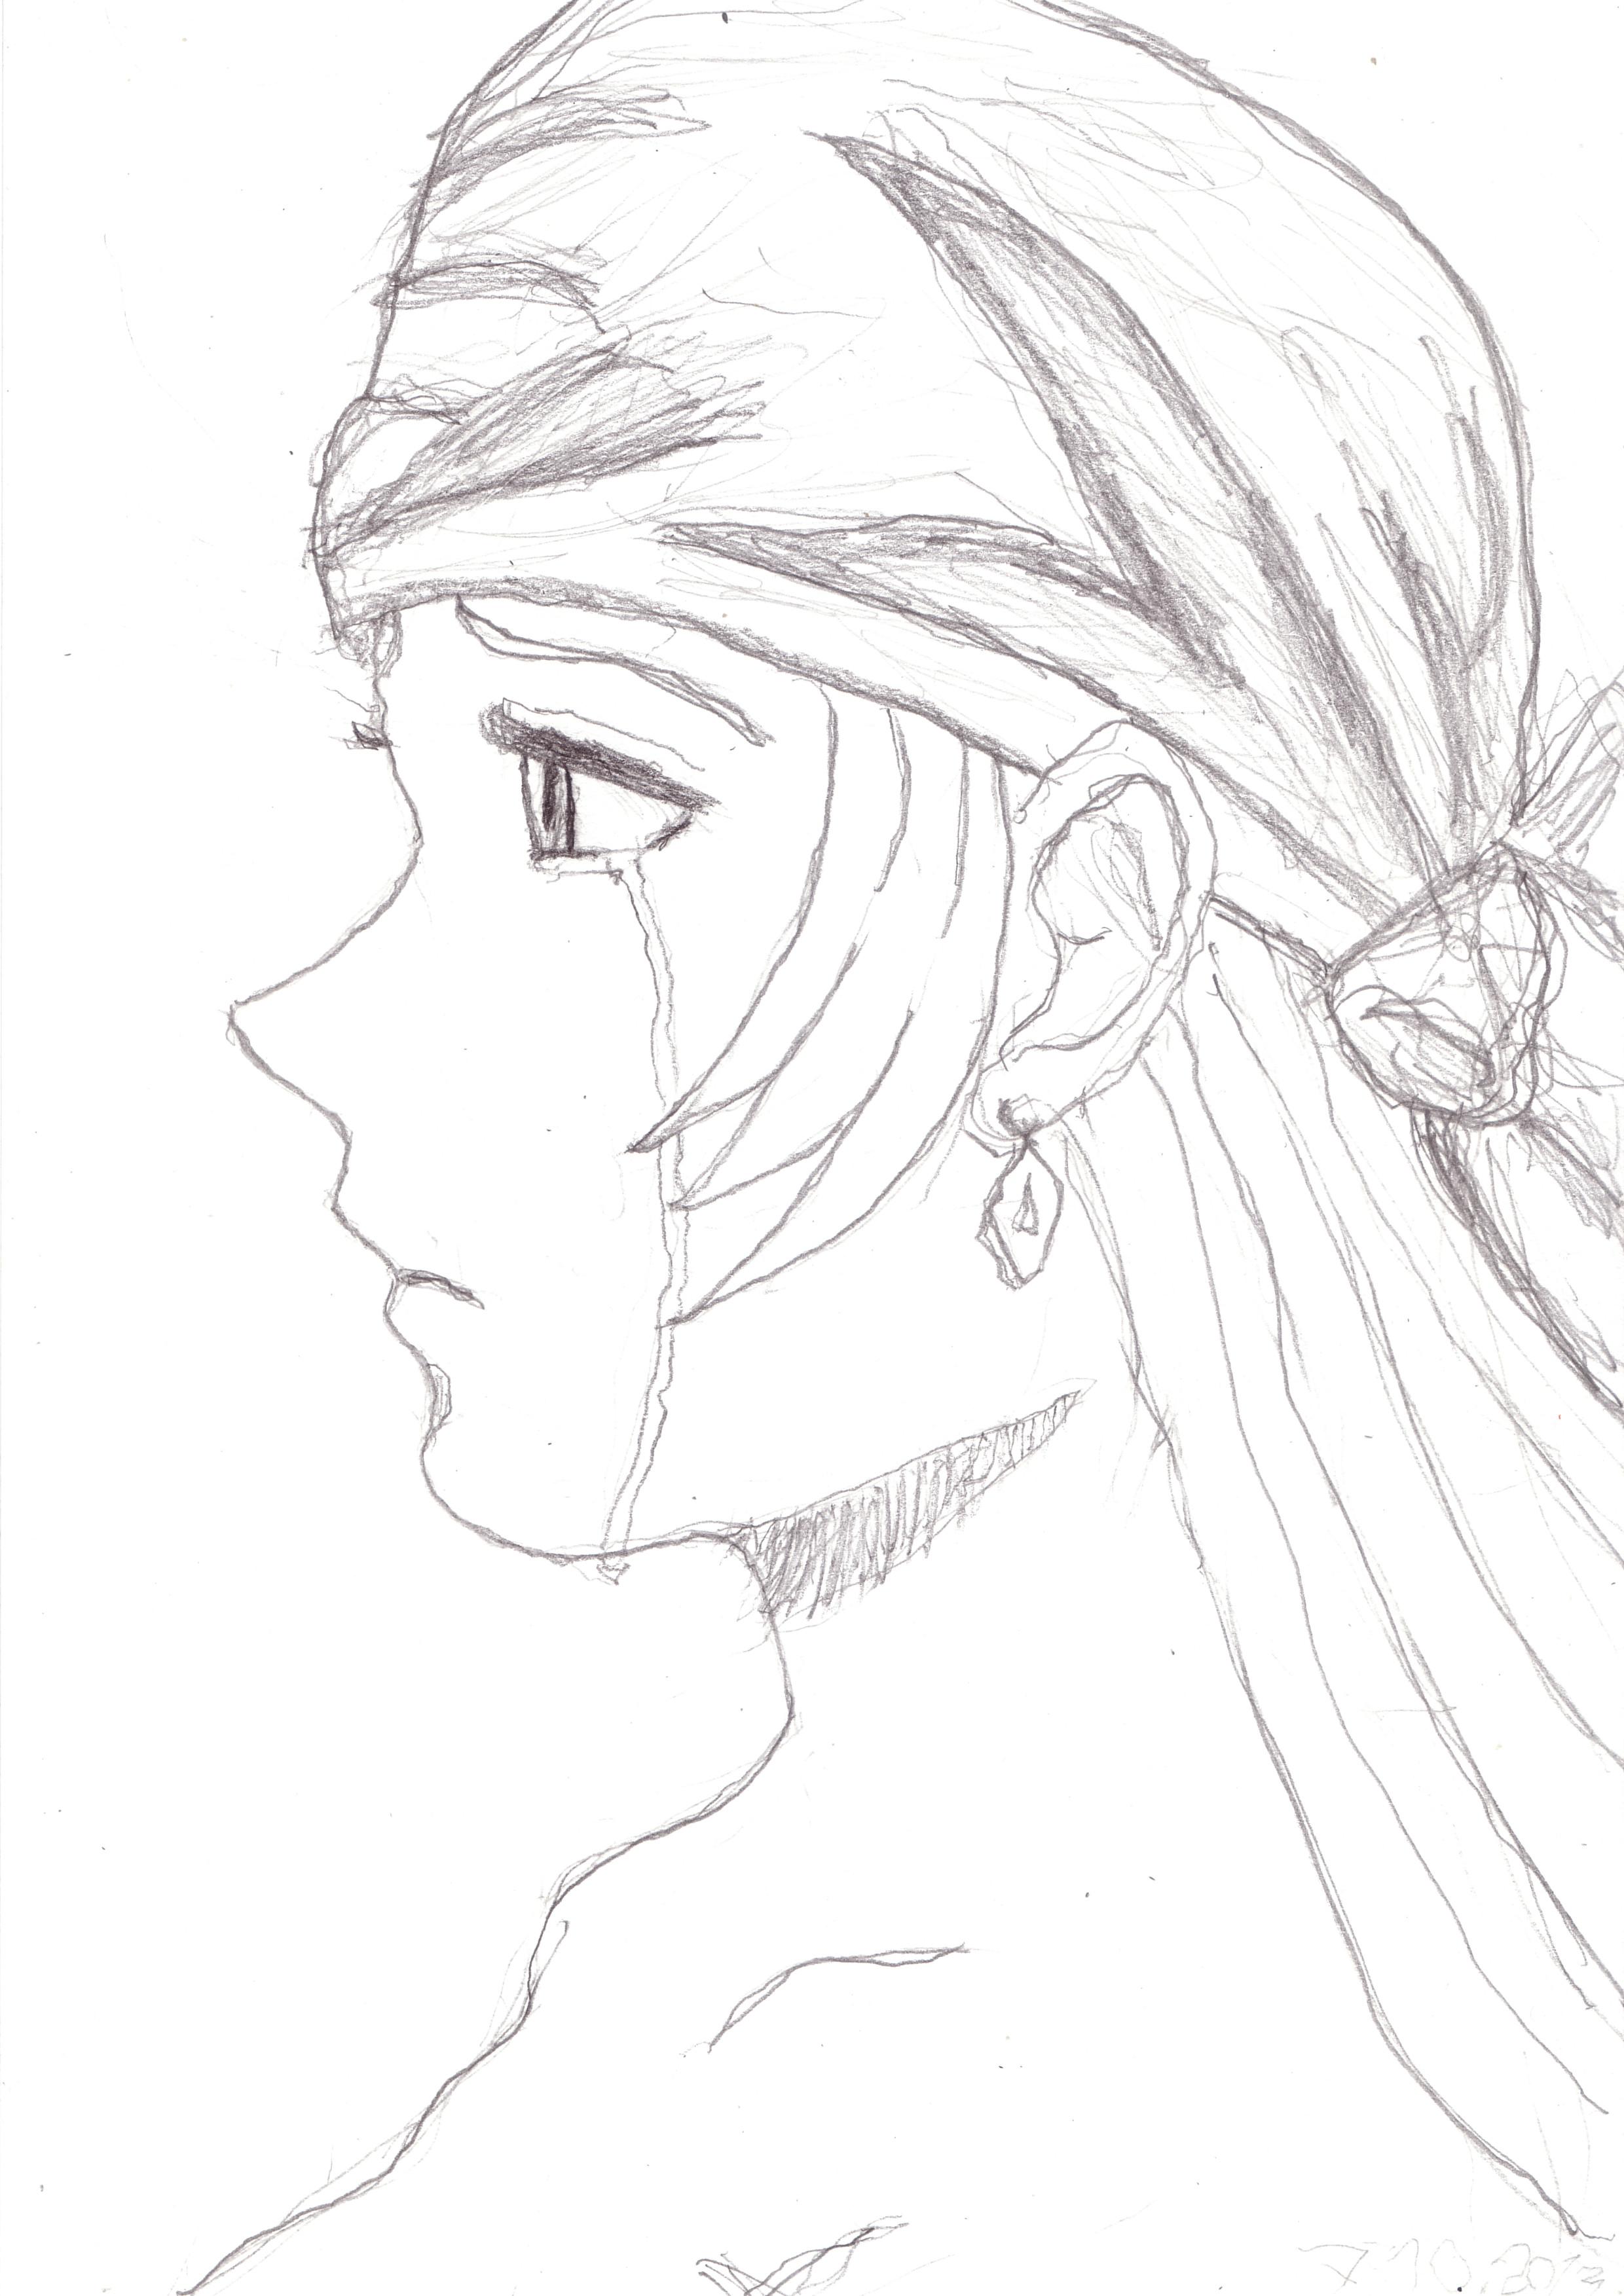 Critique de yume n 4 le mangakoaching par manga ink - Profil dessin ...